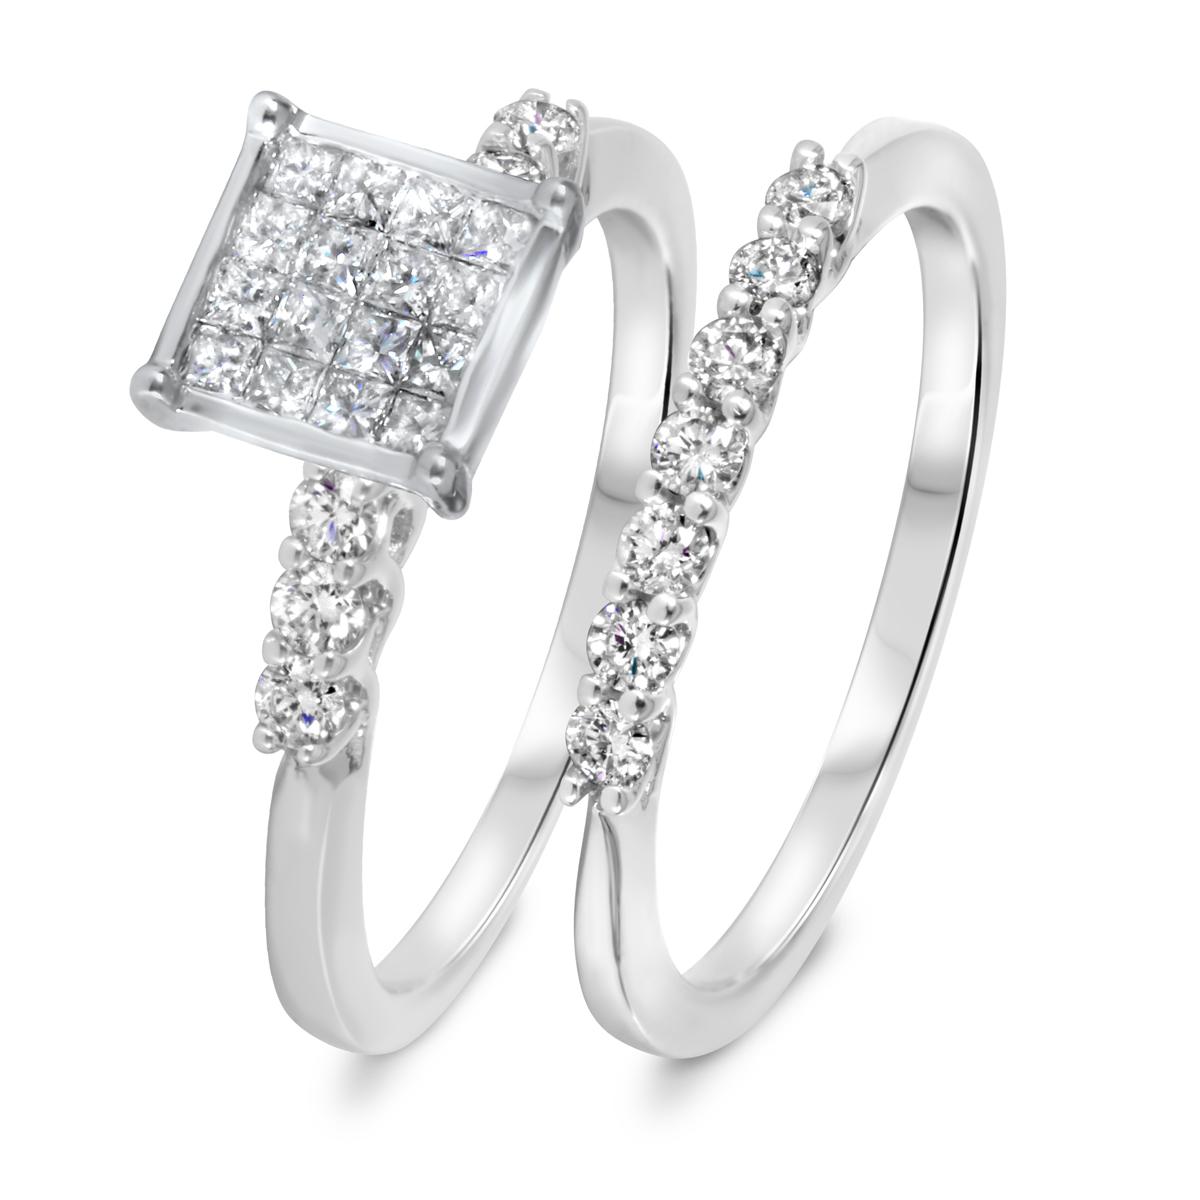 3/4 CT. T.W. Diamond Women's Bridal Wedding Ring Set 14K White Gold